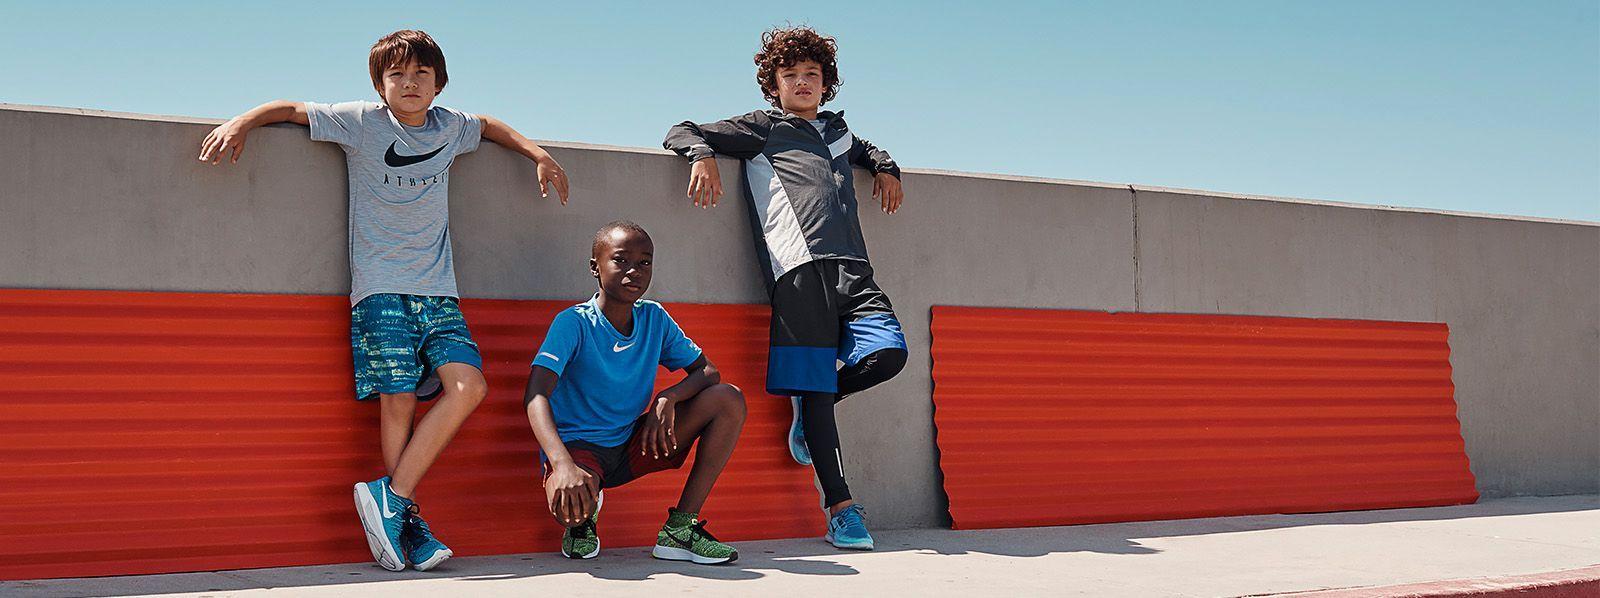 nike kids Google Search Nike kids, Nike football